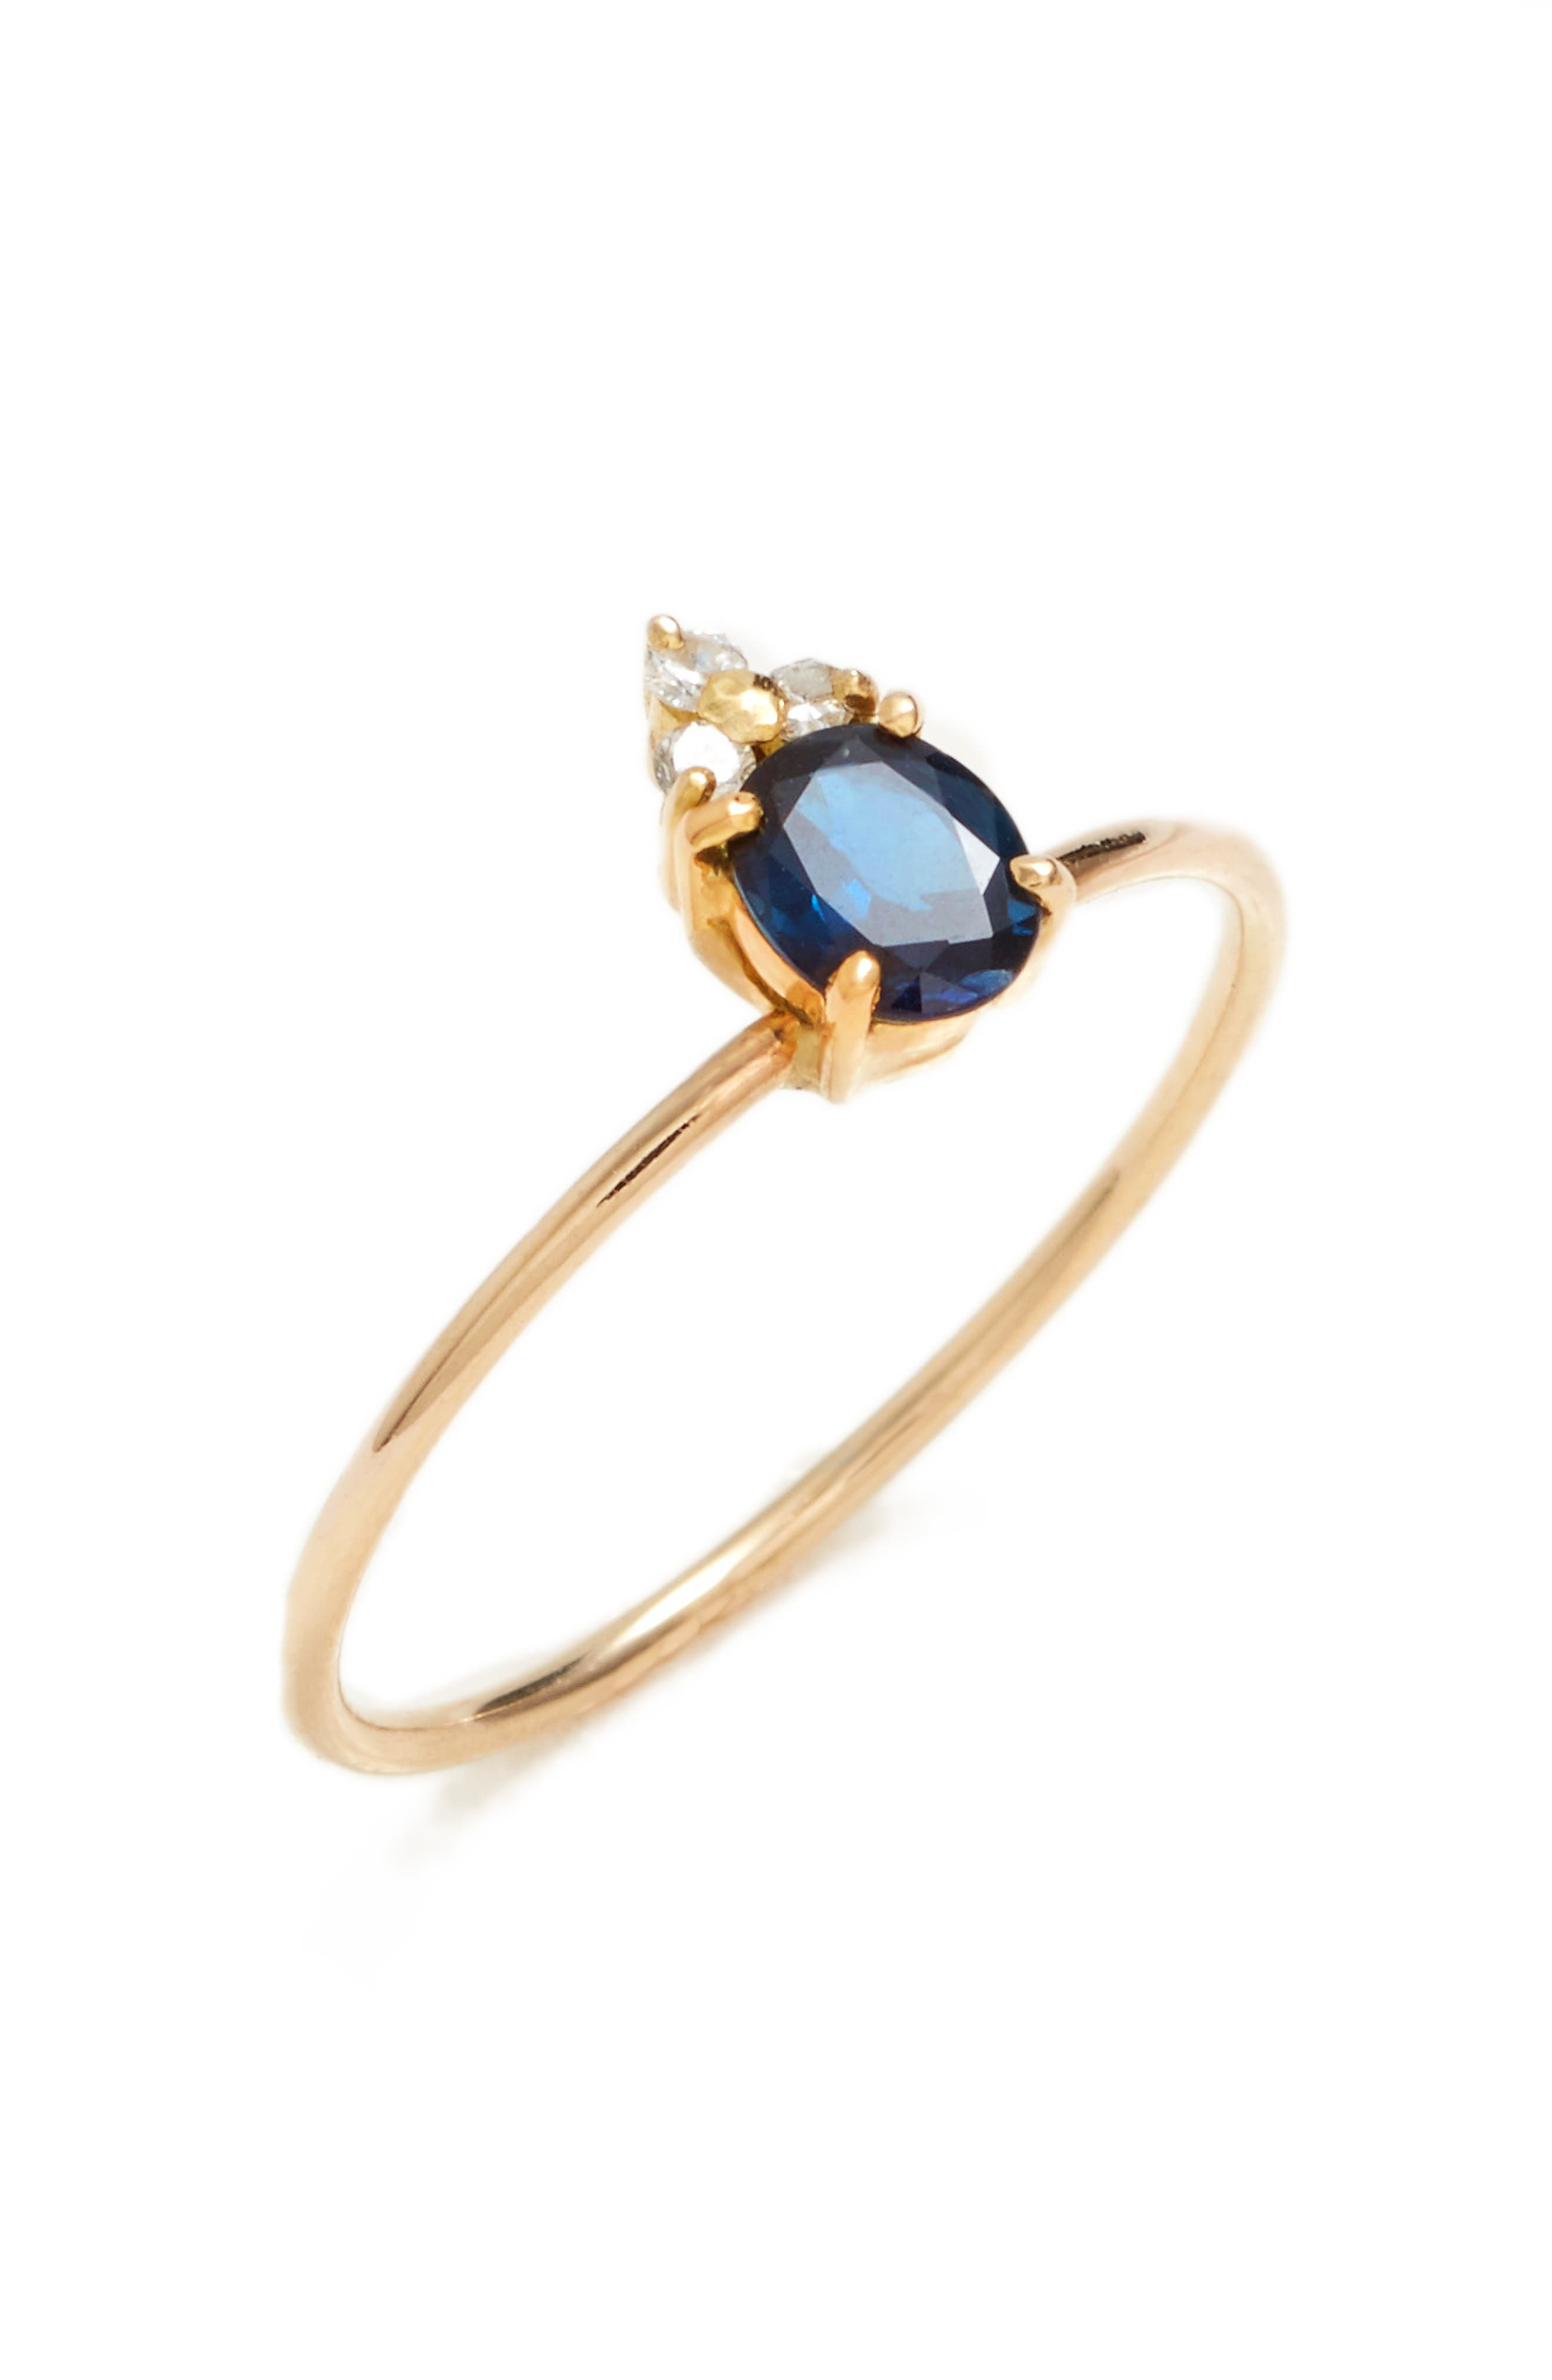 Skinny Stone Sapphire & Diamond Ring,                         Main,                         color, Yellow Gold/ Blue Sapphire